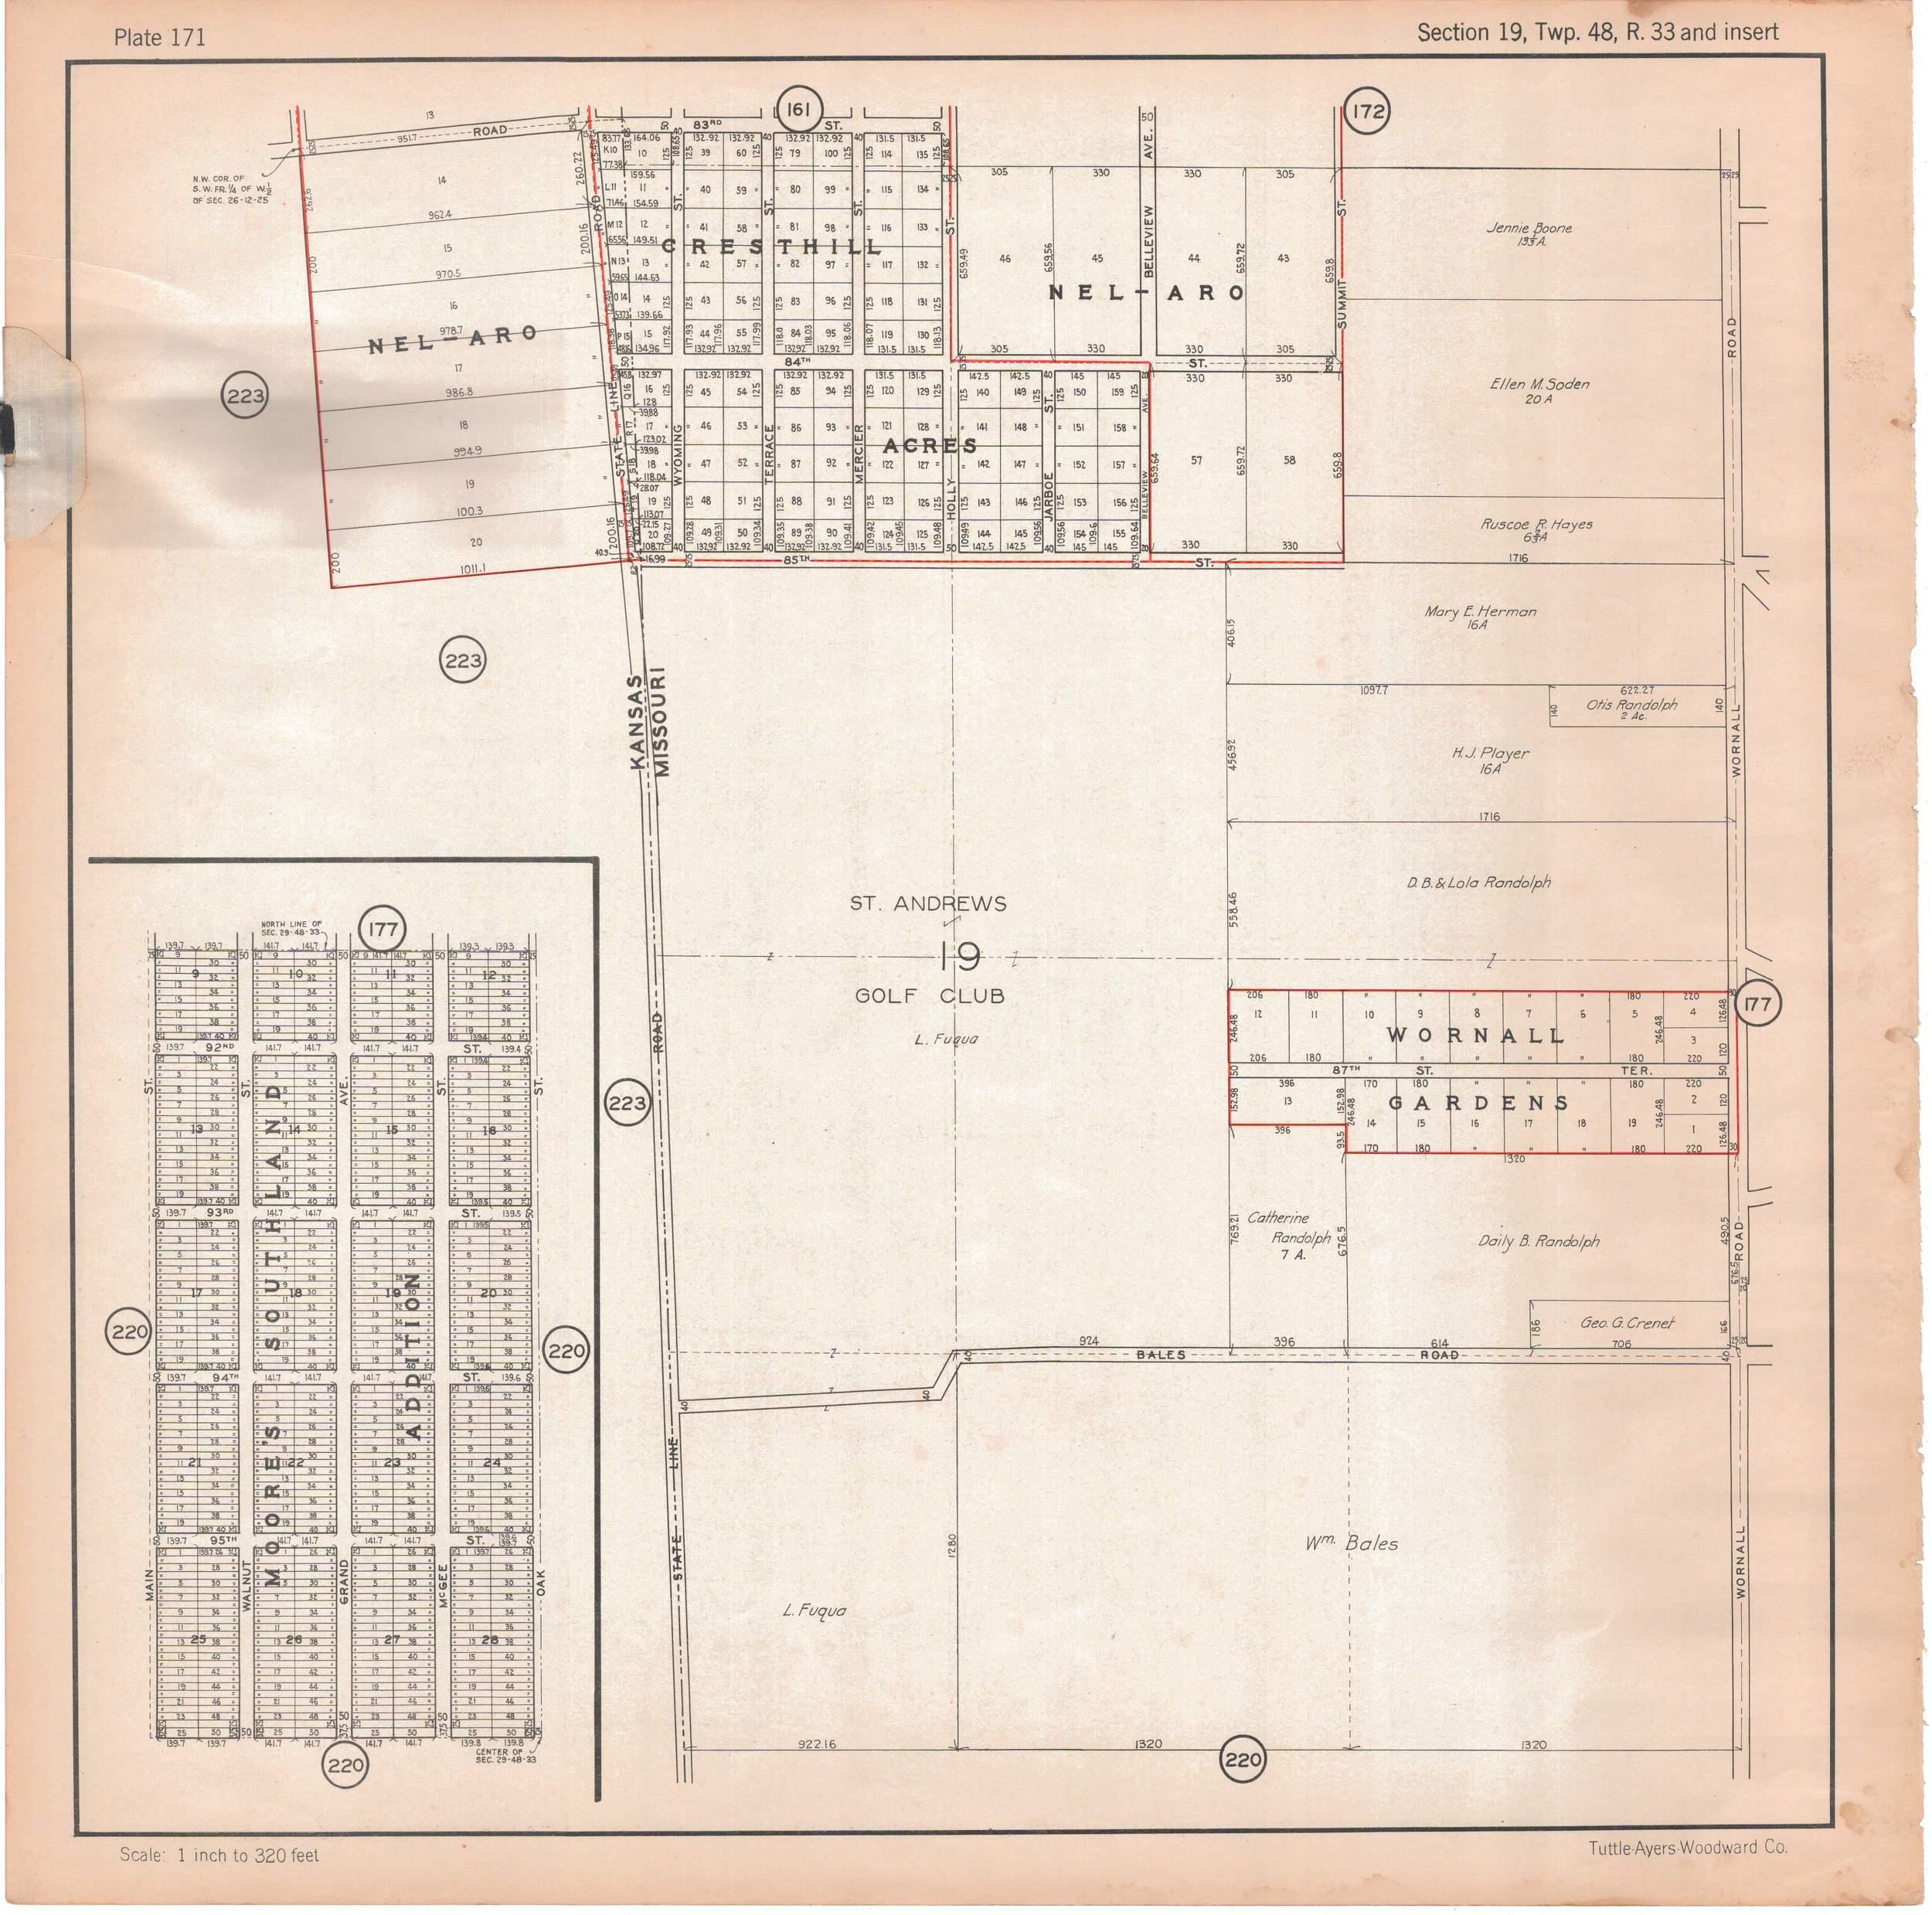 1925 TUTTLE_AYERS_Plate_171.JPG